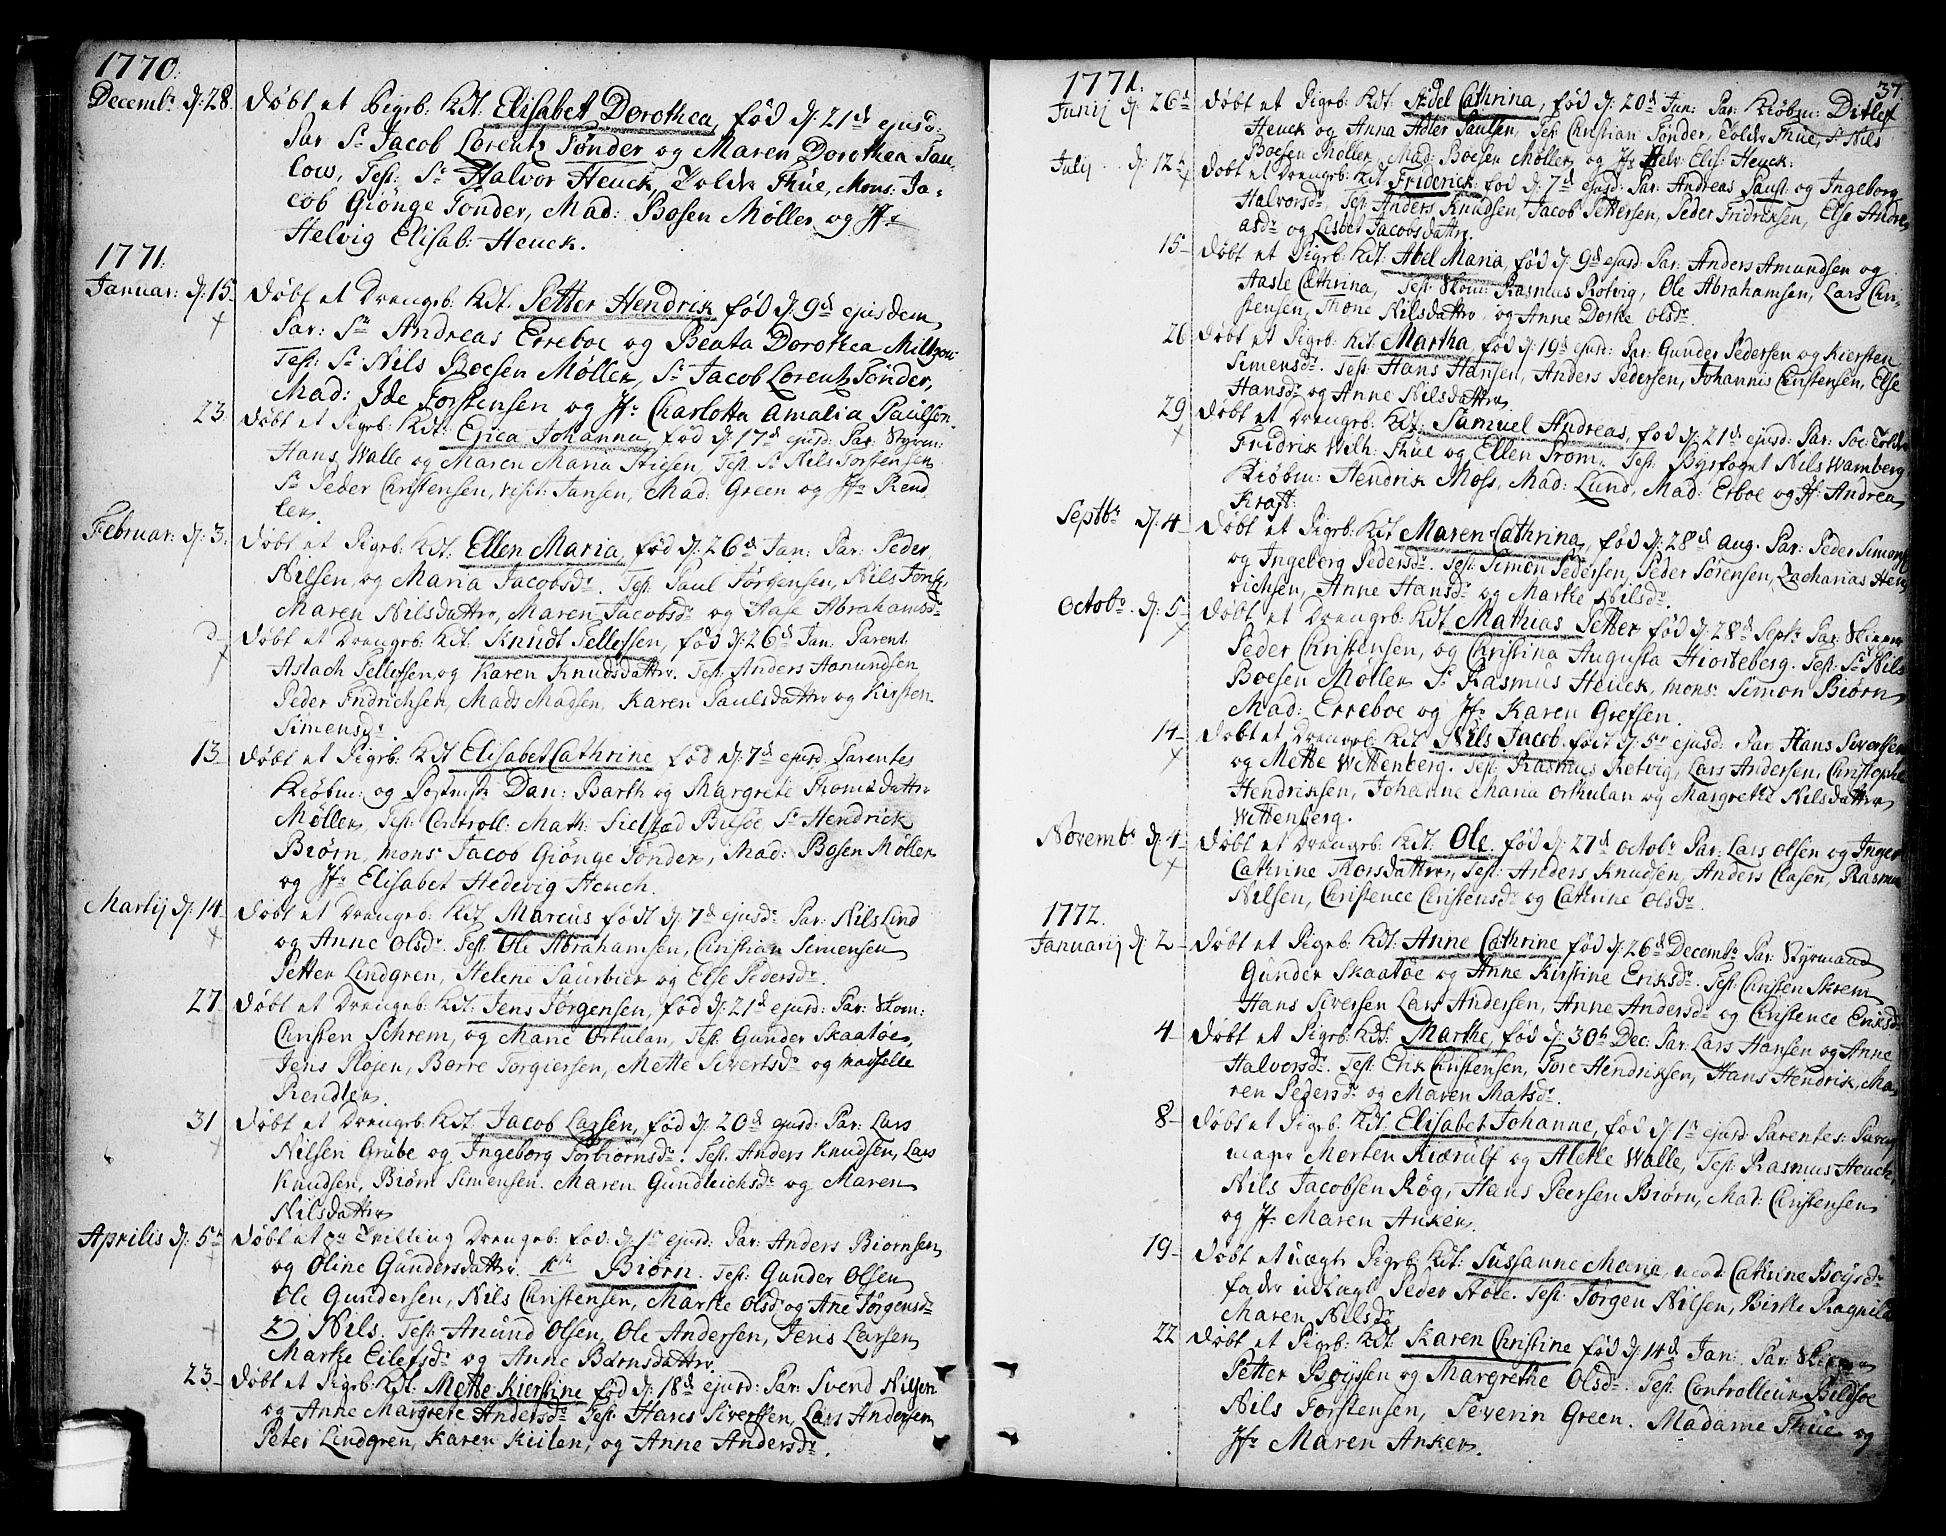 SAKO, Kragerø kirkebøker, F/Fa/L0002: Ministerialbok nr. 2, 1767-1802, s. 37